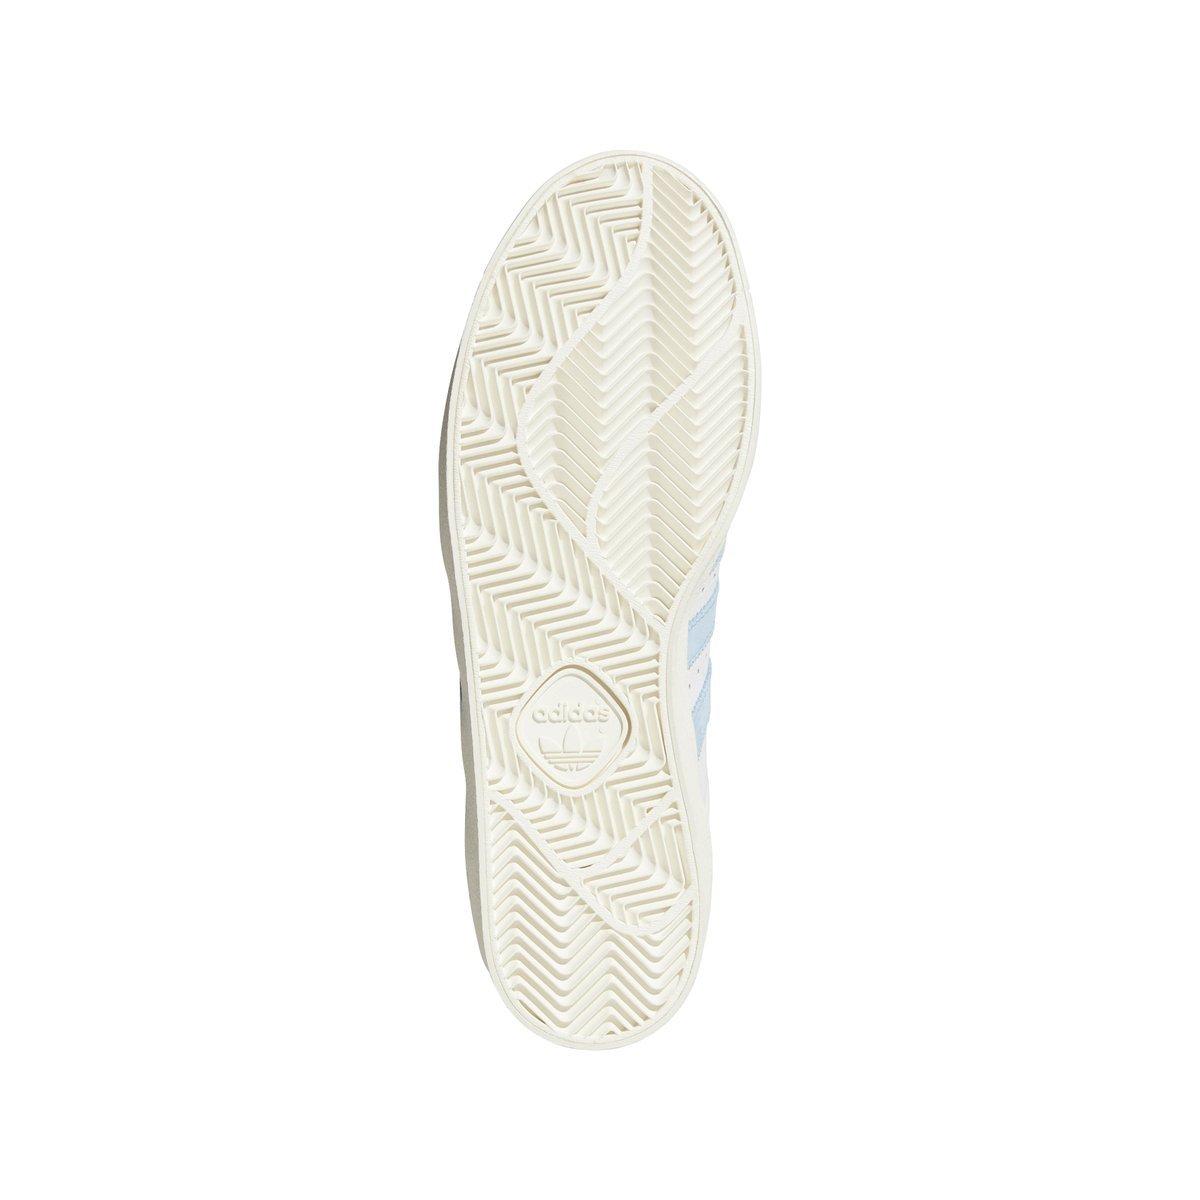 hommes / femmes est adidas adidas adidas superstar x krooked chaussures en cuir blanc, facile à utiliser, bb16194 valeur d'actualisation a28600